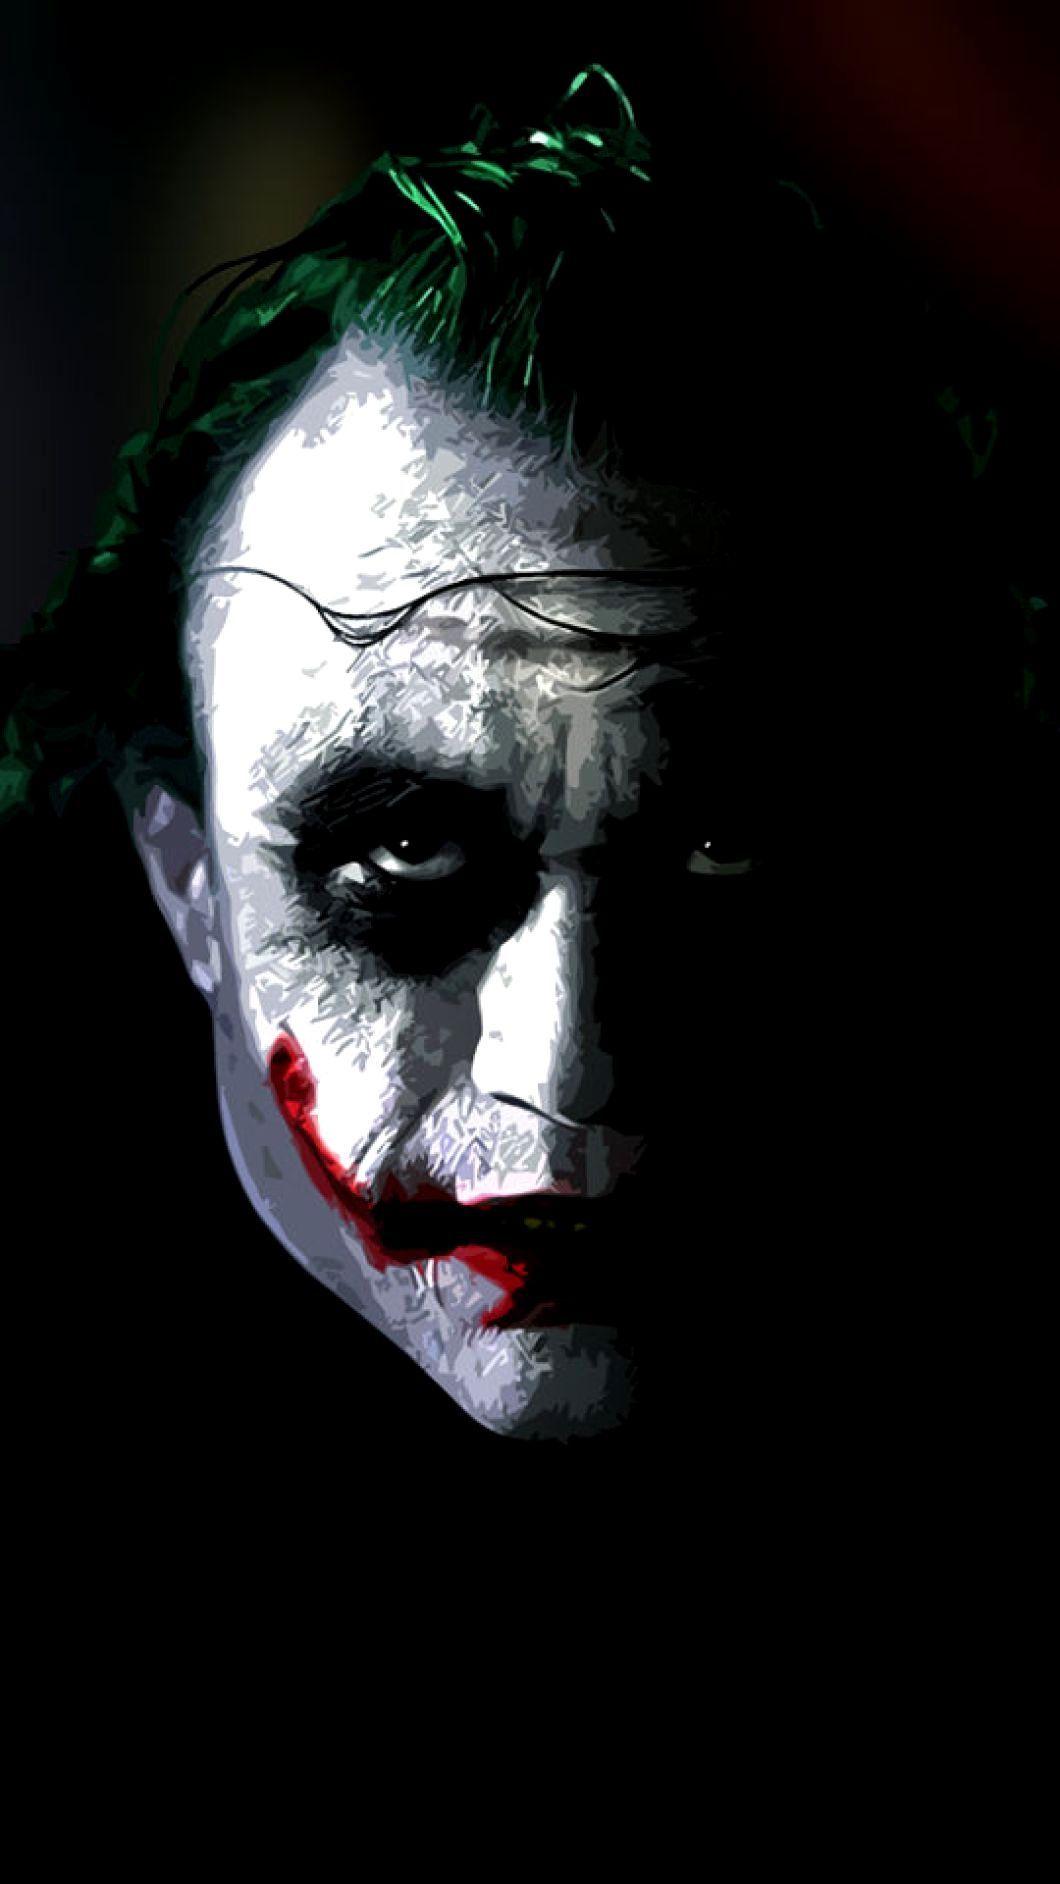 Joker Wallpaper 4K Mobile Download Gallery Joker